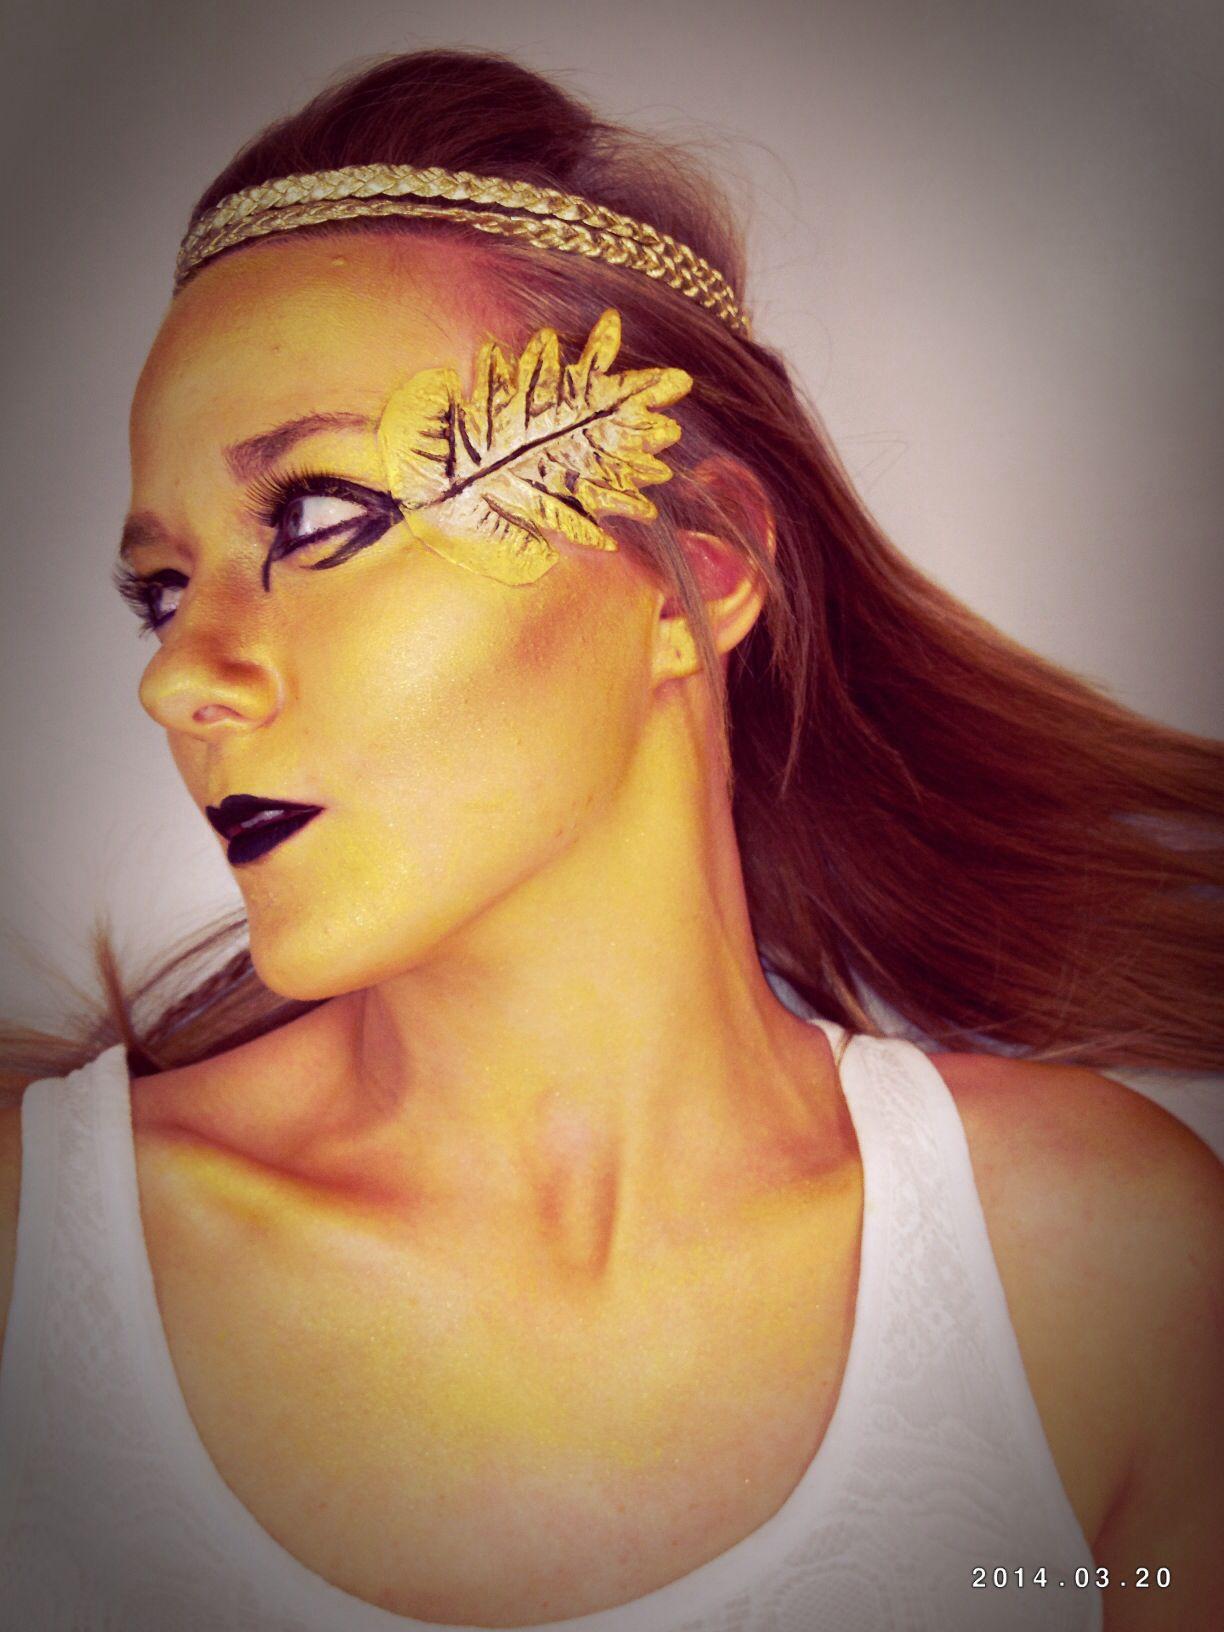 Gelatine prosthetic makeup, Greek golden statue, MUA Chloe Palser, model @Jess Robin MUA